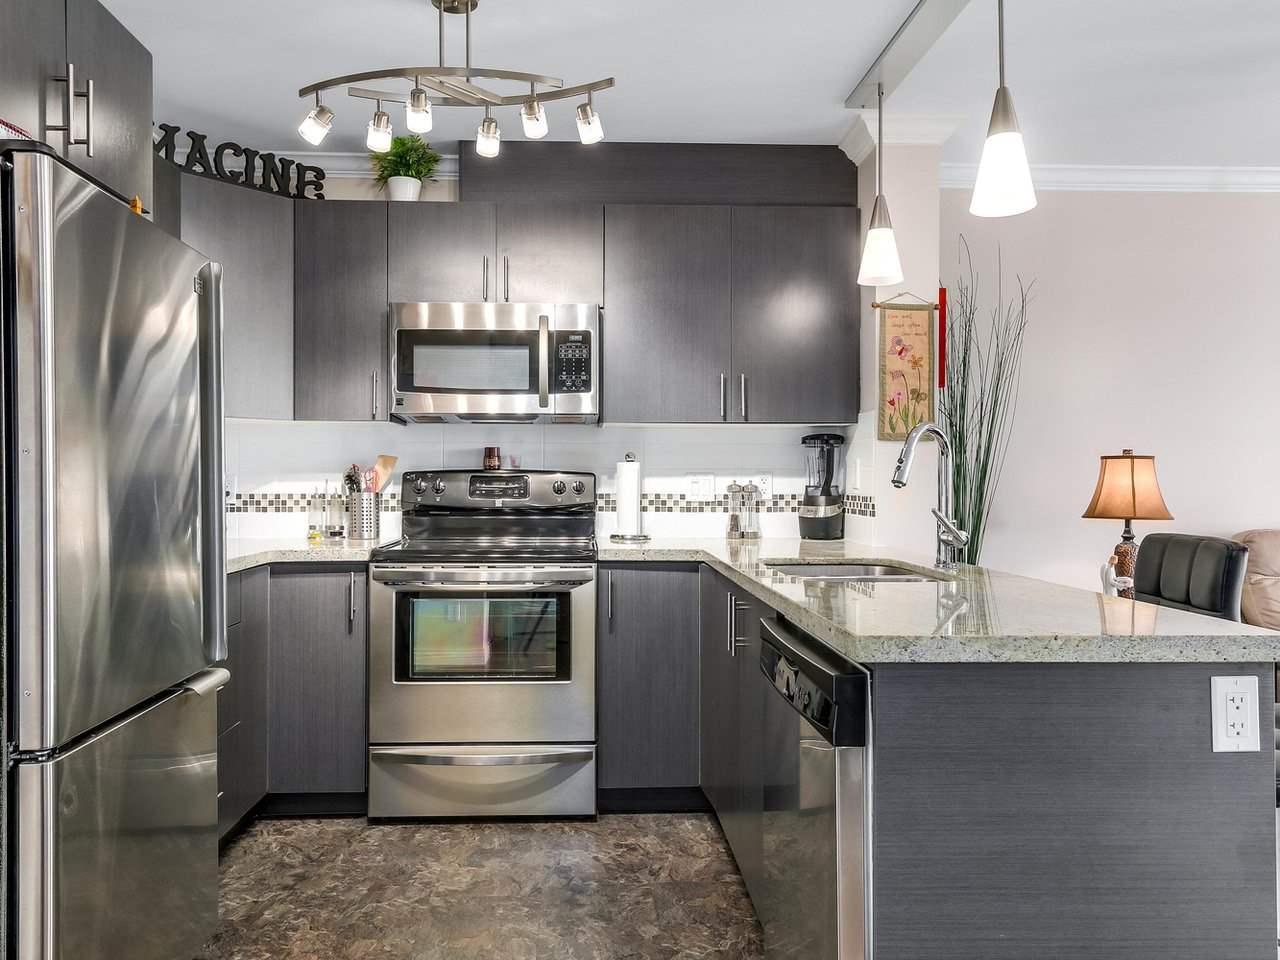 Condo Apartment at 206 7738 EDMONDS STREET, Unit 206, Burnaby East, British Columbia. Image 10